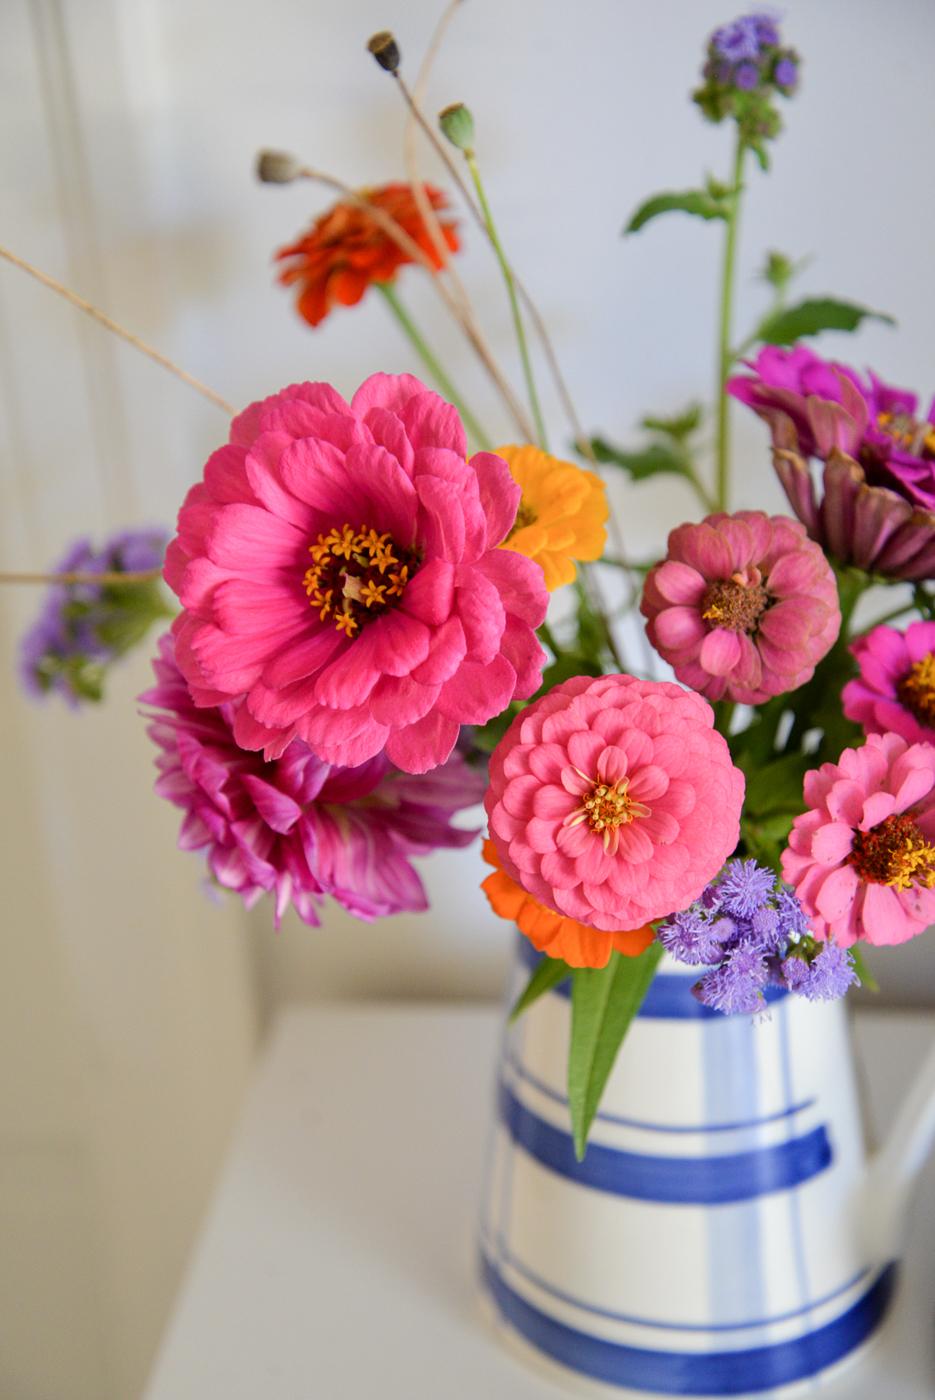 fall zinnias, fall seasonal flowers, vase with fall flowers, cutting garden fall flowers